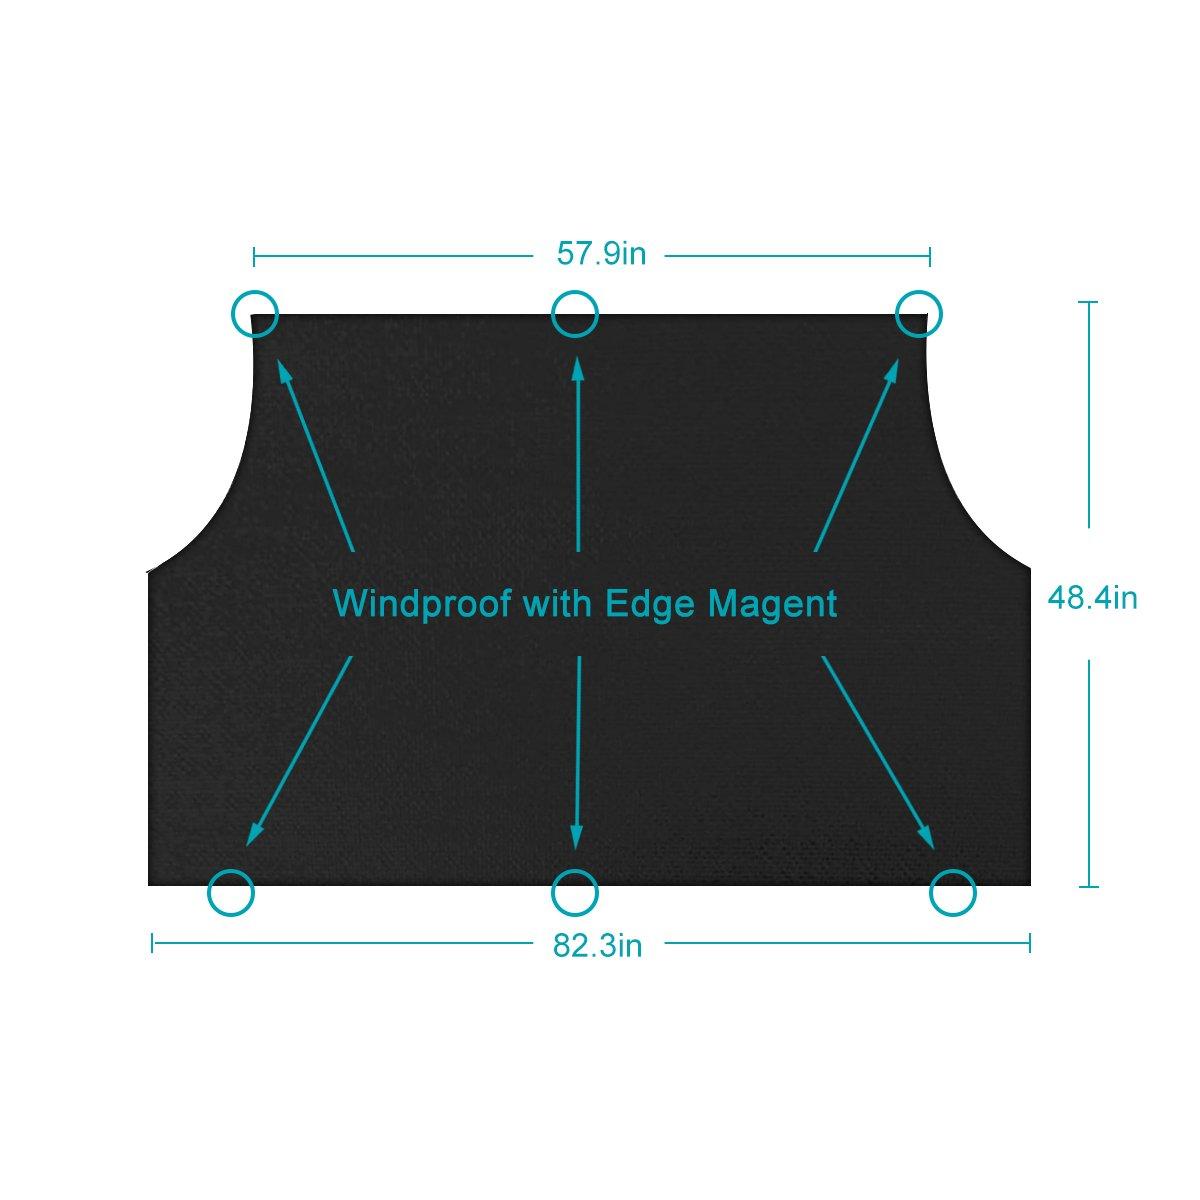 Yoobure Premium Car Windshield Snow Cover Sun Shade Protector Visor Front Rear Windshield Cover Block Shields Car Window Cover Keeps Ice /& Snow Off /…